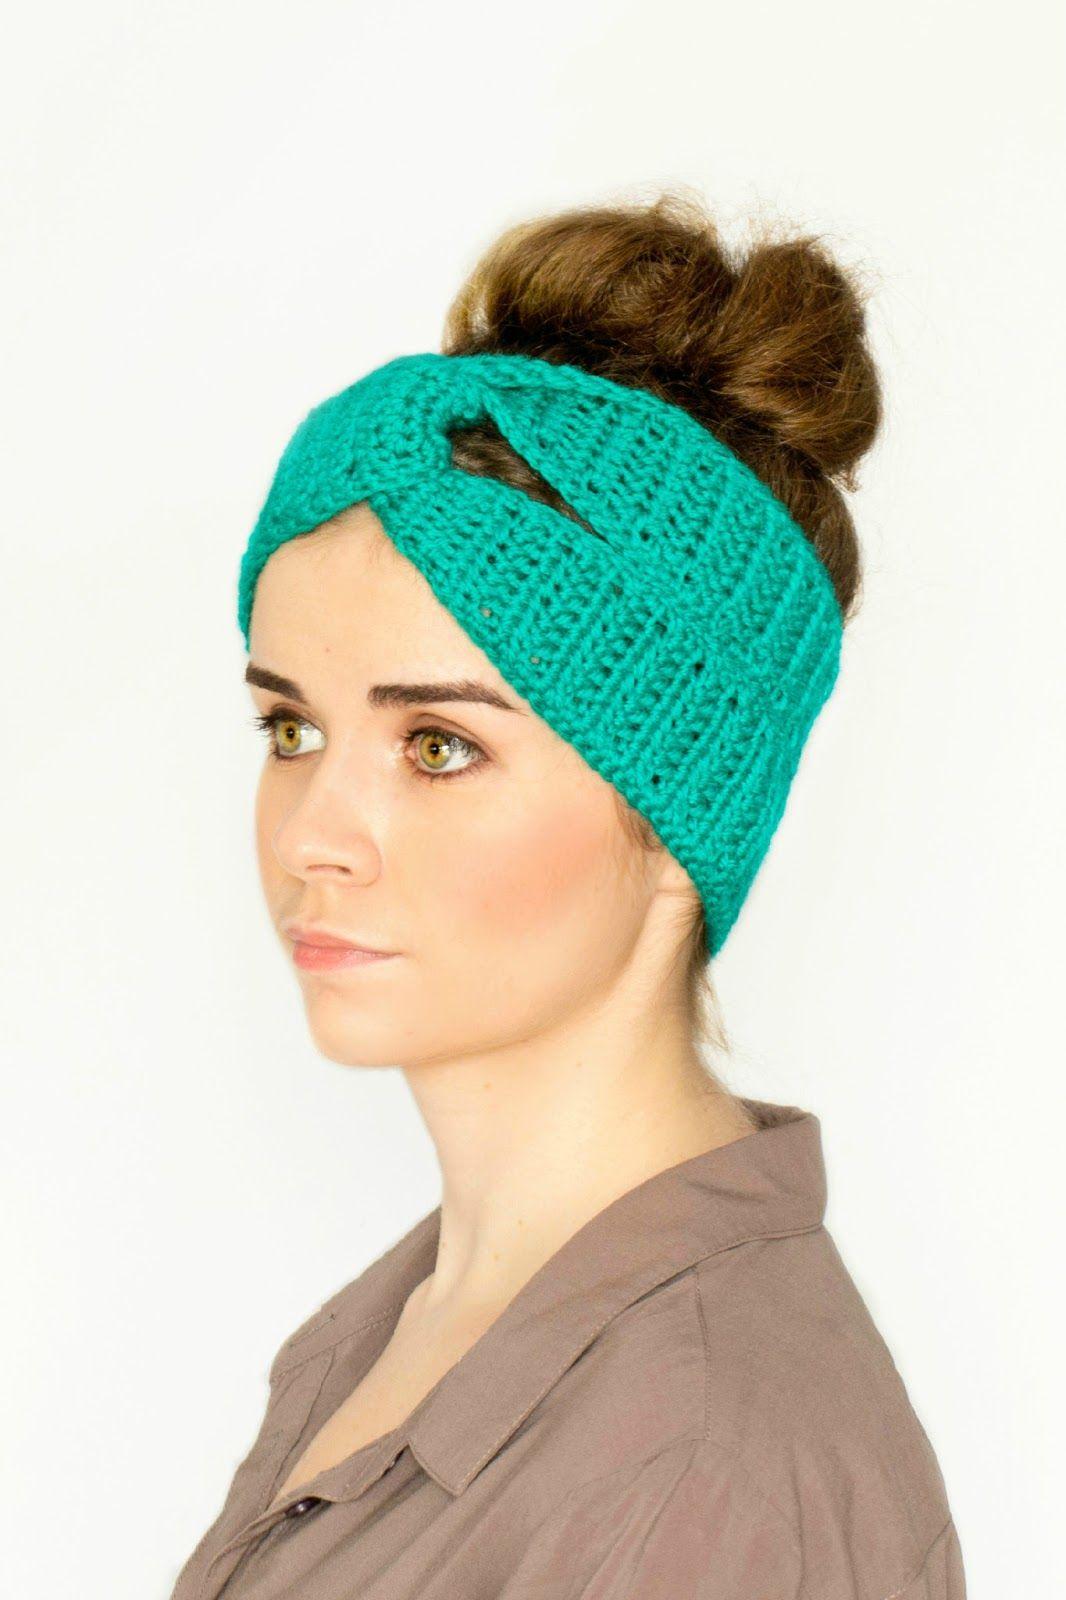 Twisted Turban Headband Crochet Pattern | Hopeful honey, Turban ...